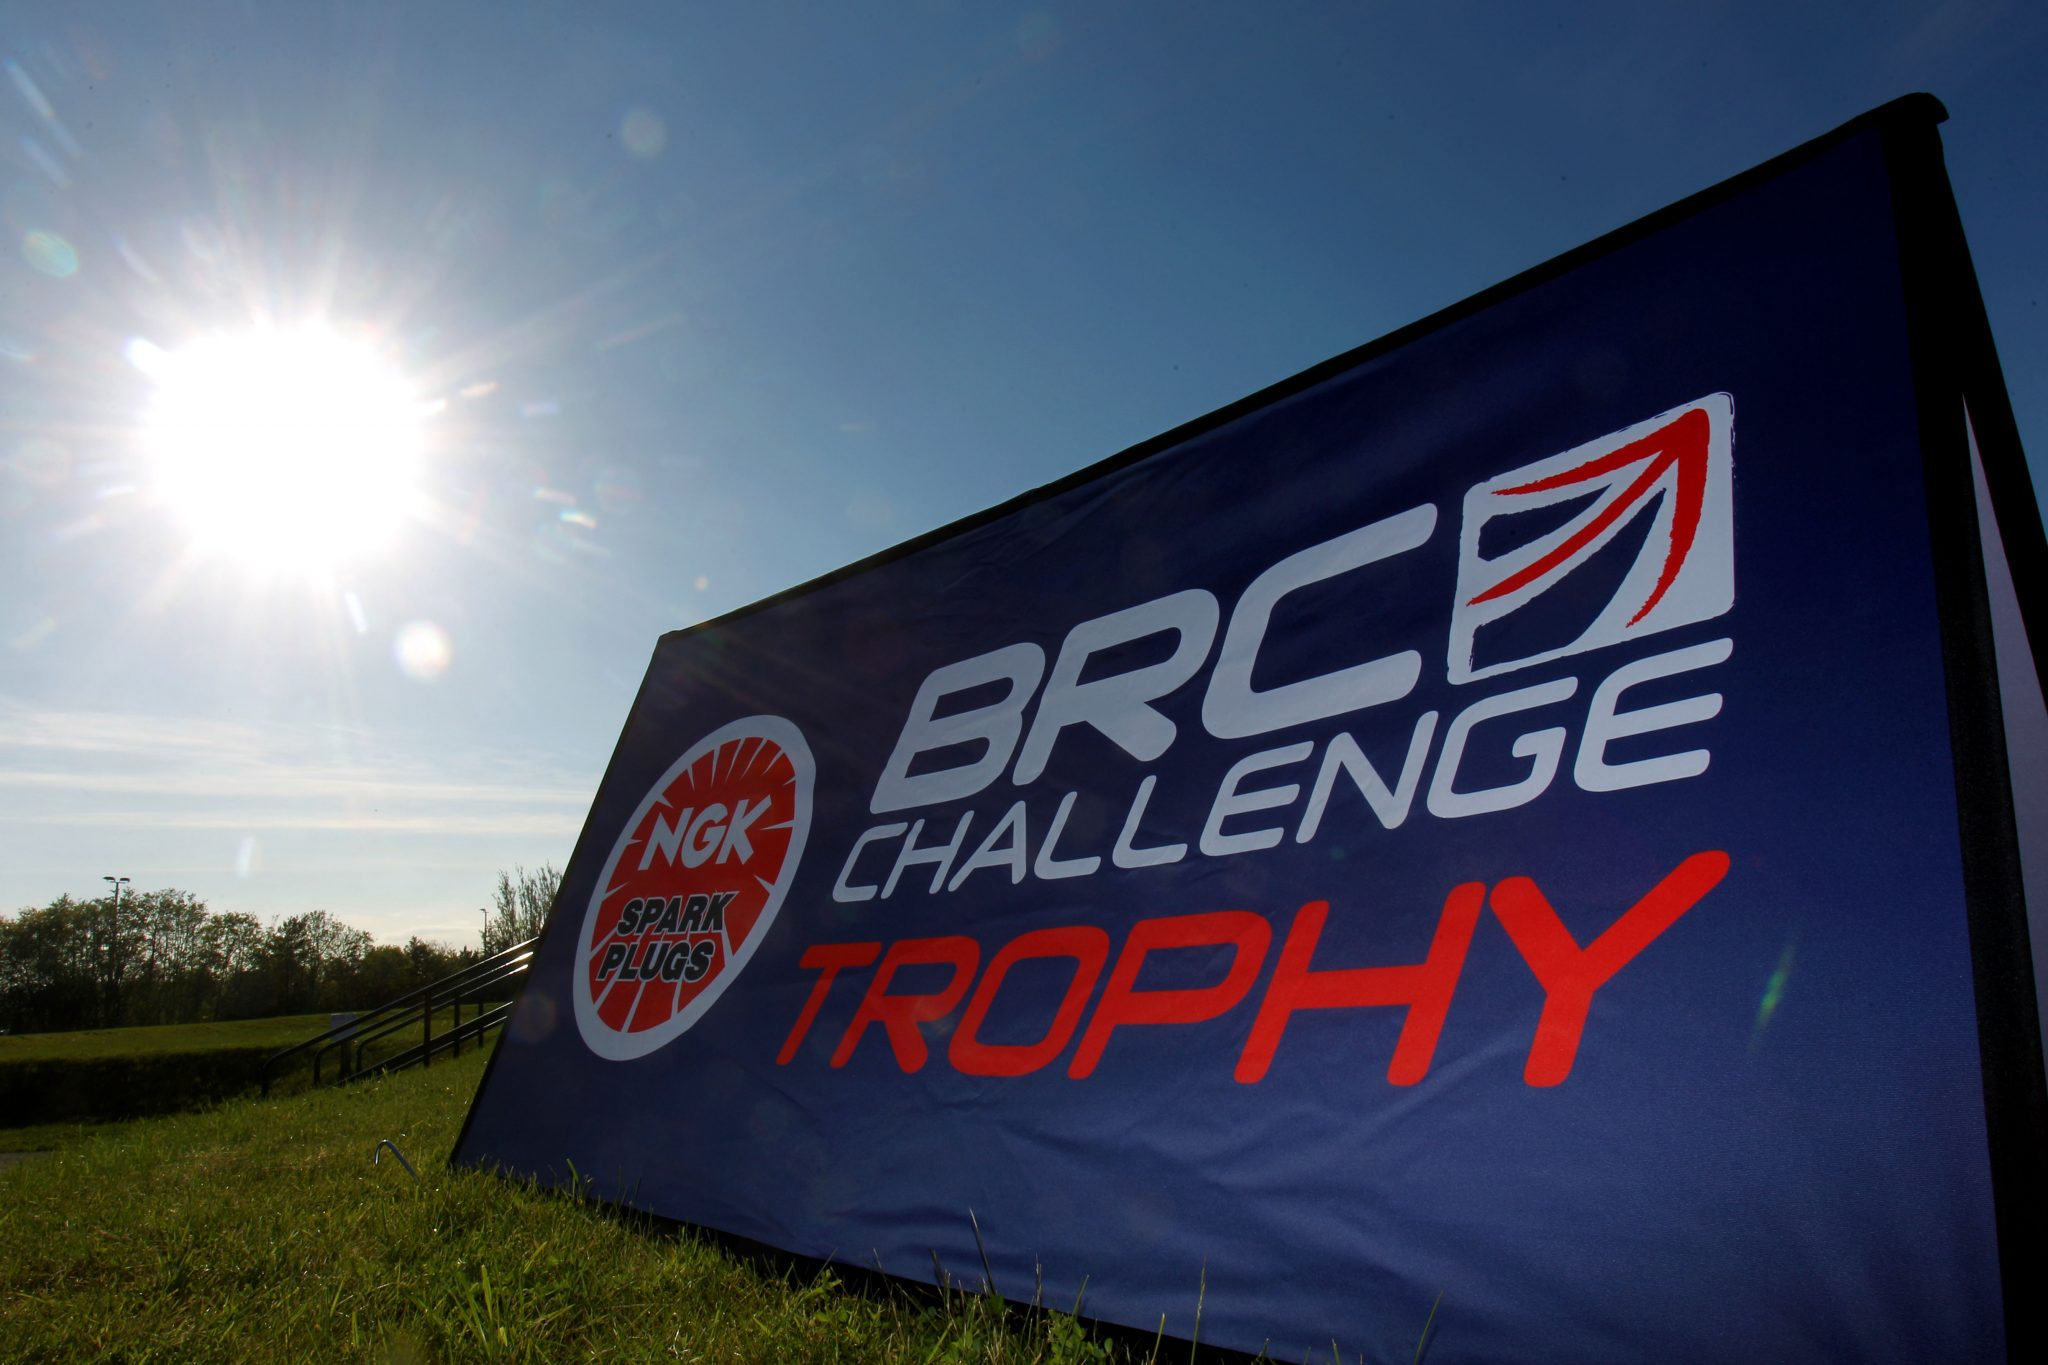 3004, 3004, British Rally Championship, BRC-15.jpg, 245833, https://surfturf.co.uk/wp-content/uploads/2018/06/BRC-15.jpg, https://surfturf.co.uk/case-studies/british-rally/attachment/british-rally-championship-13/, , 3, , British Rally Championship, british-rally-championship-13, inherit, 849, 2018-11-28 14:22:56, 2018-11-28 14:22:56, 0, image/jpeg, image, jpeg, https://surfturf.co.uk/wp-includes/images/media/default.png, 2048, 1365, Array